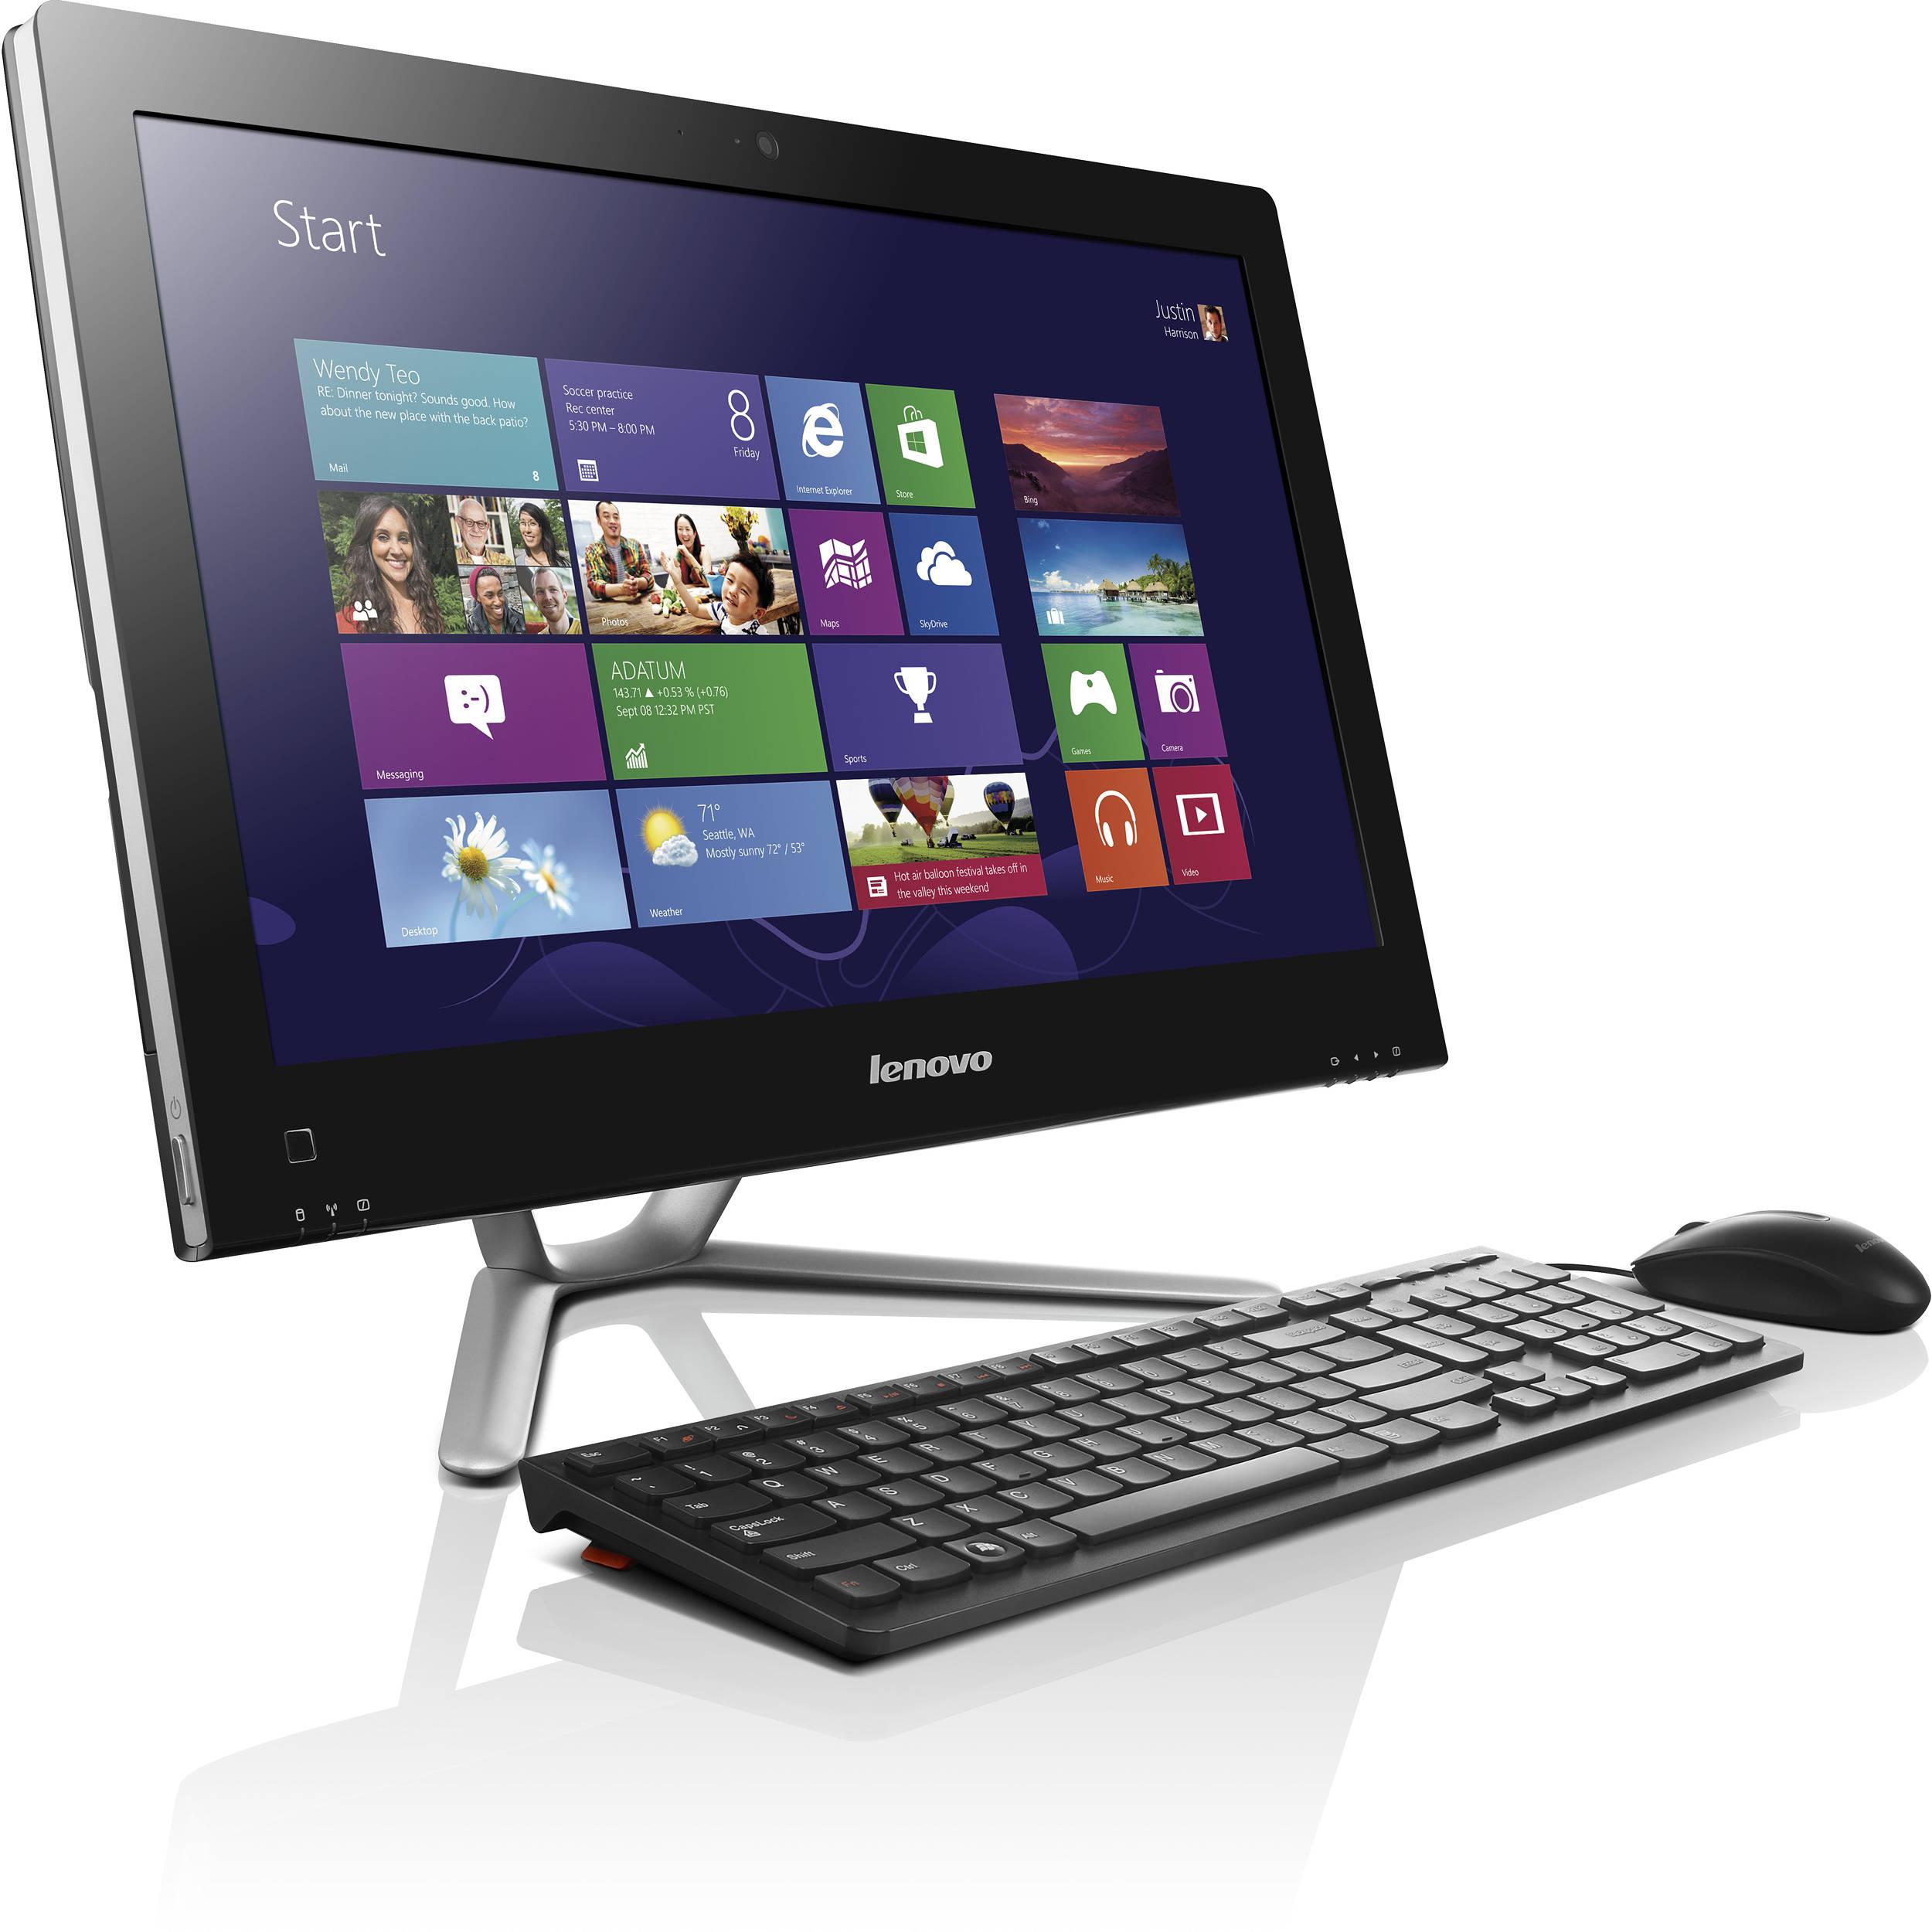 lenovo c540 23 pentium g2020 all in one desktop 57312695. Black Bedroom Furniture Sets. Home Design Ideas